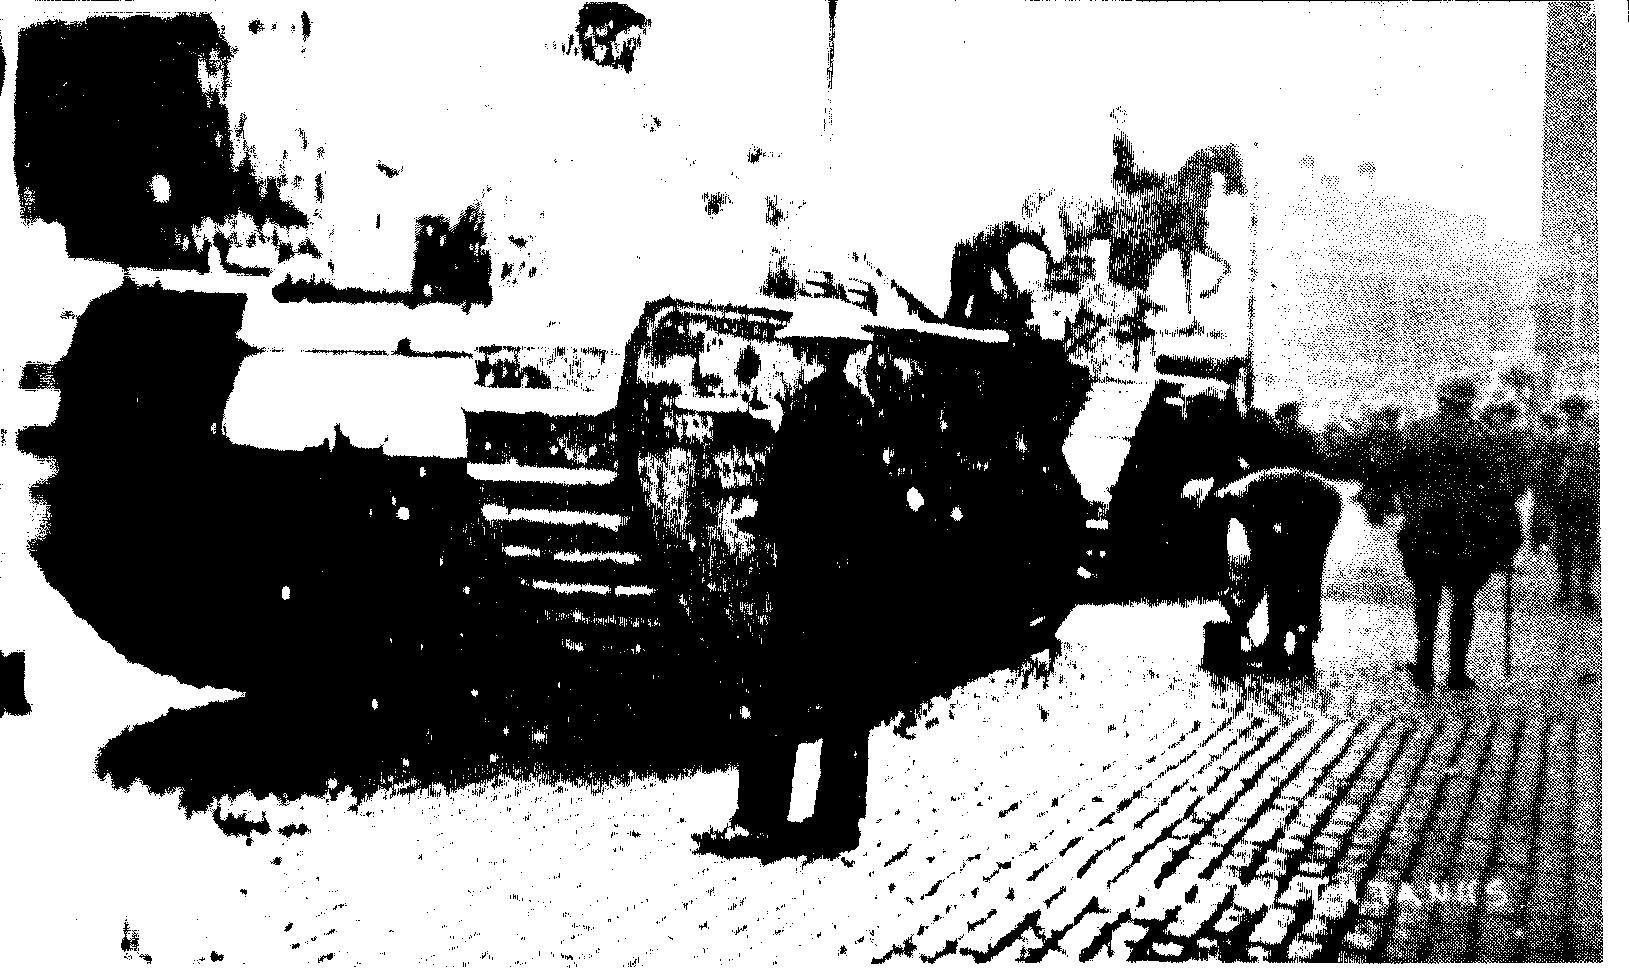 1919 tank bank